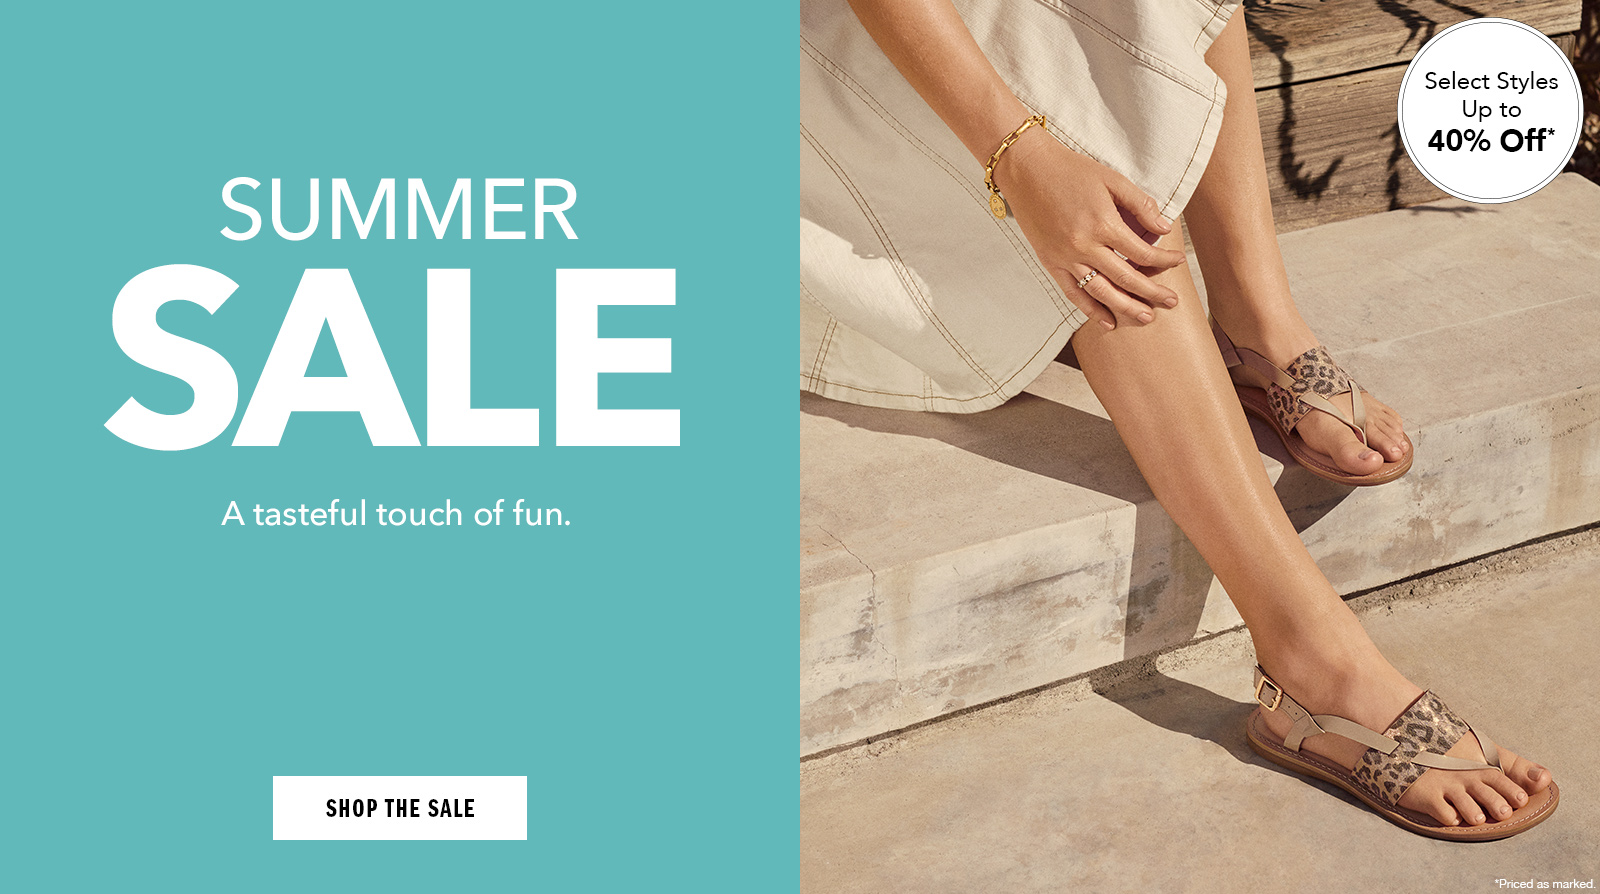 A tasteful touch of fun. - Shop Women's Summer Sale